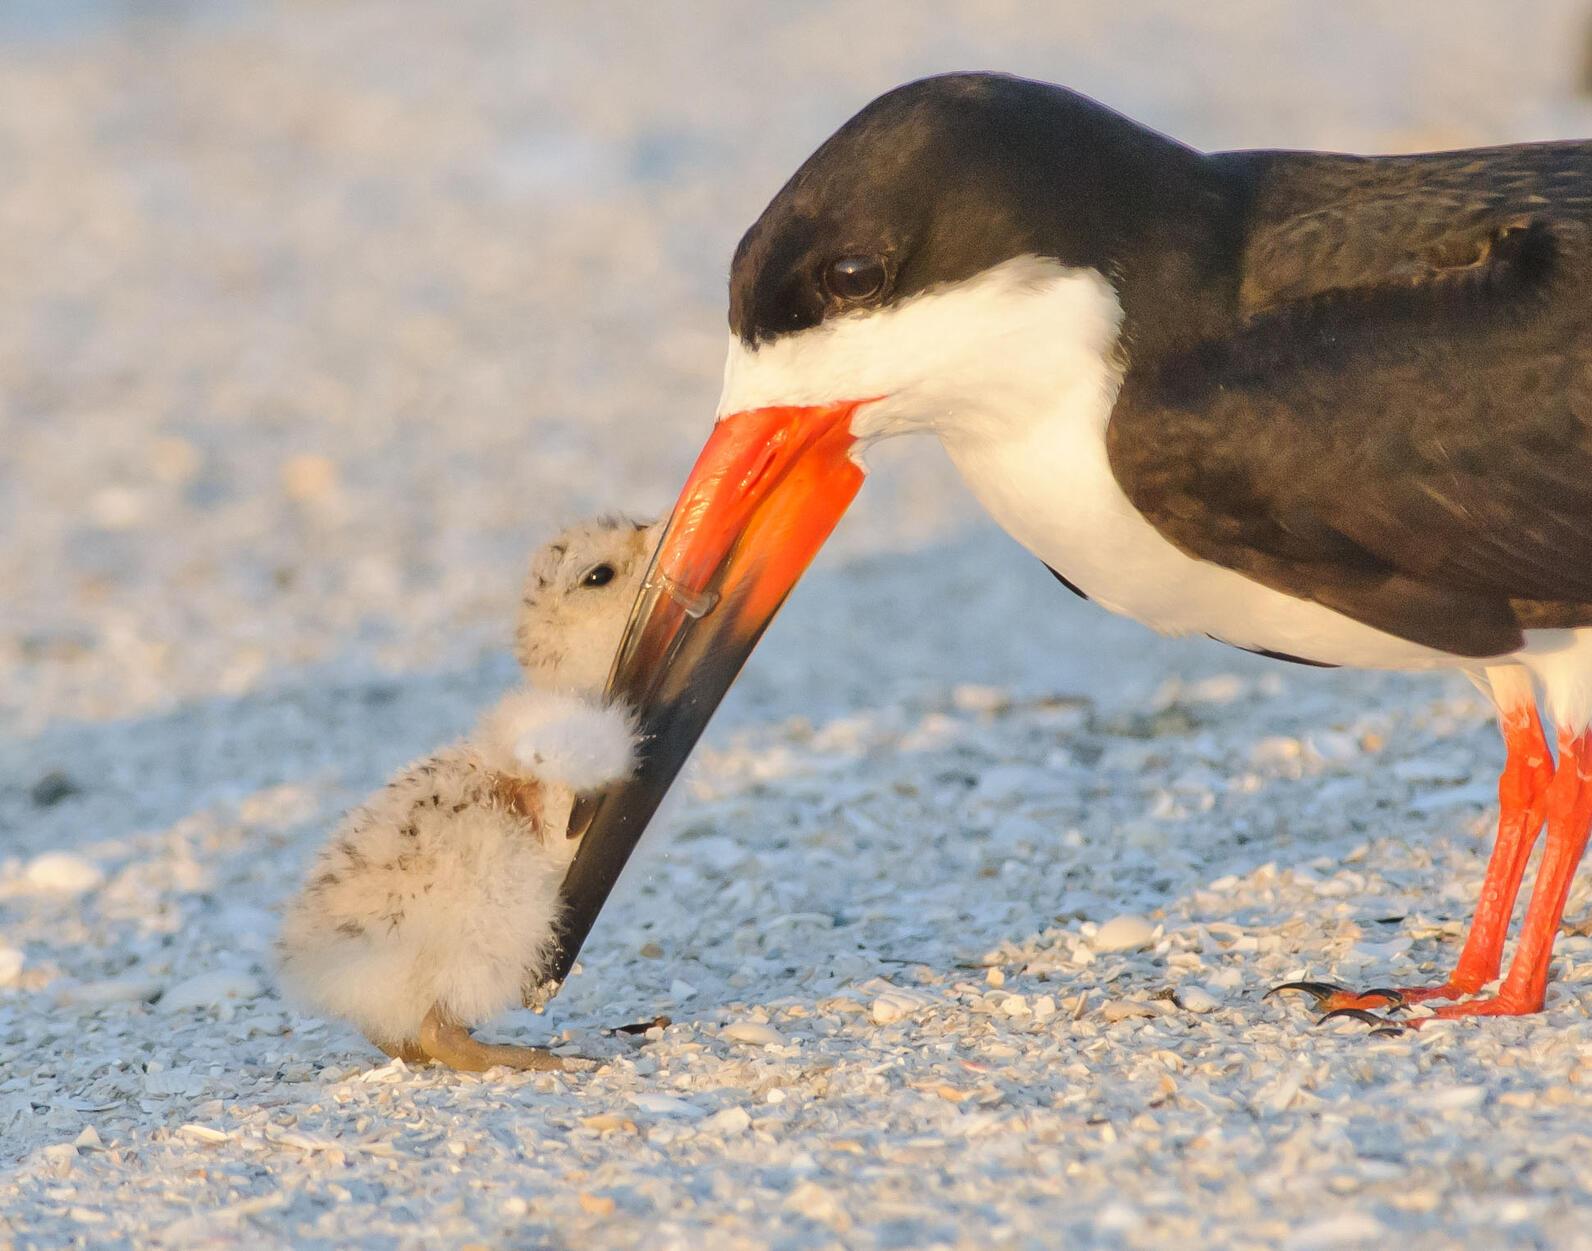 Black Skimmer and chick. Photo: Jim Gray/Audubon Photography Awards